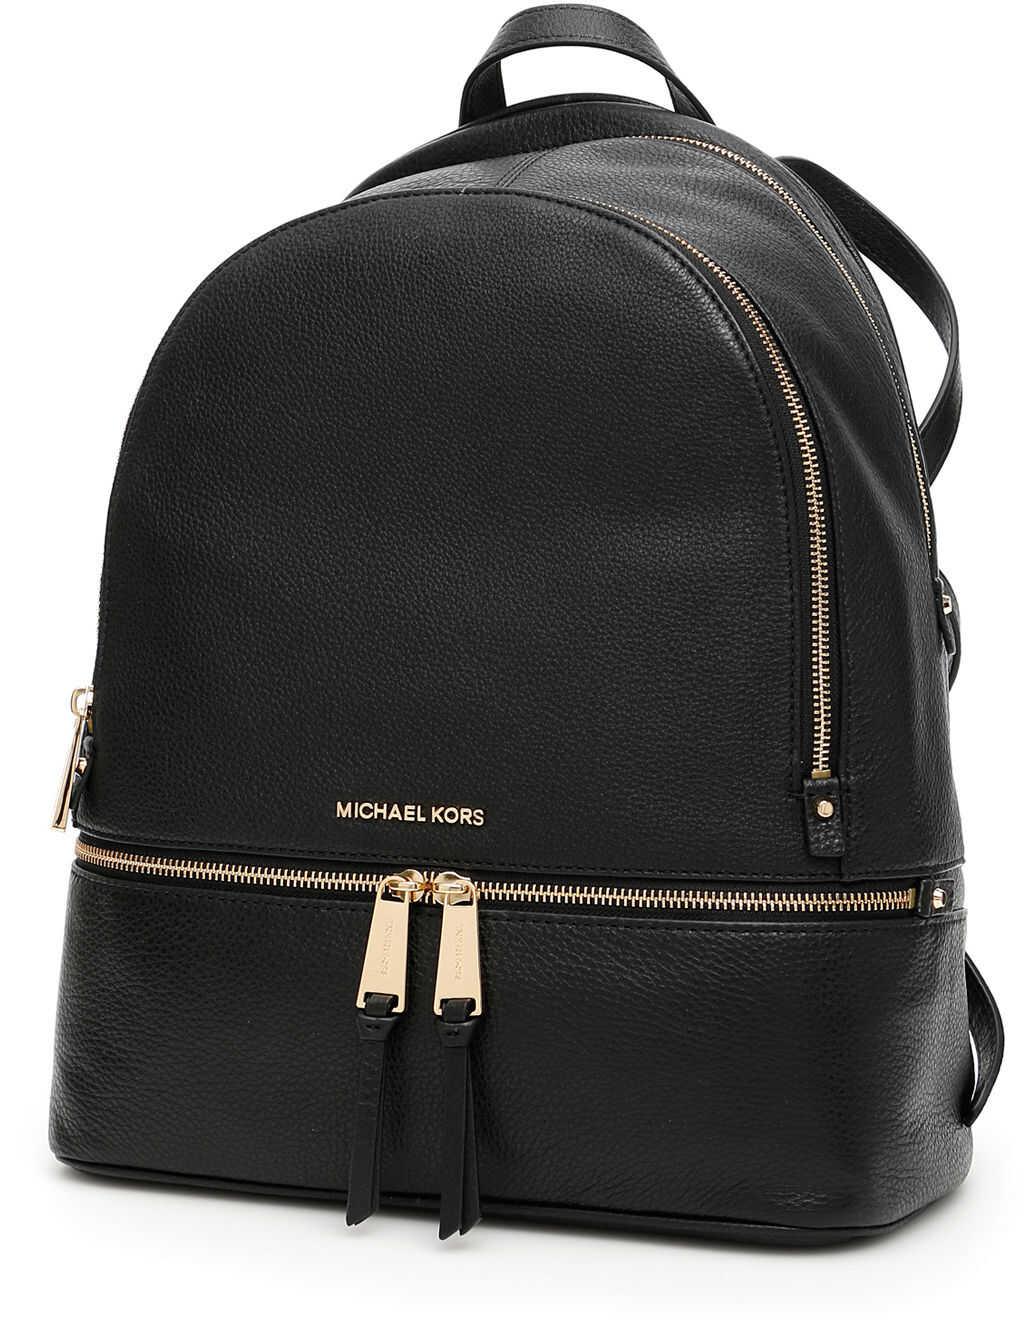 Michael Kors Large Rhea Backpack BLACK